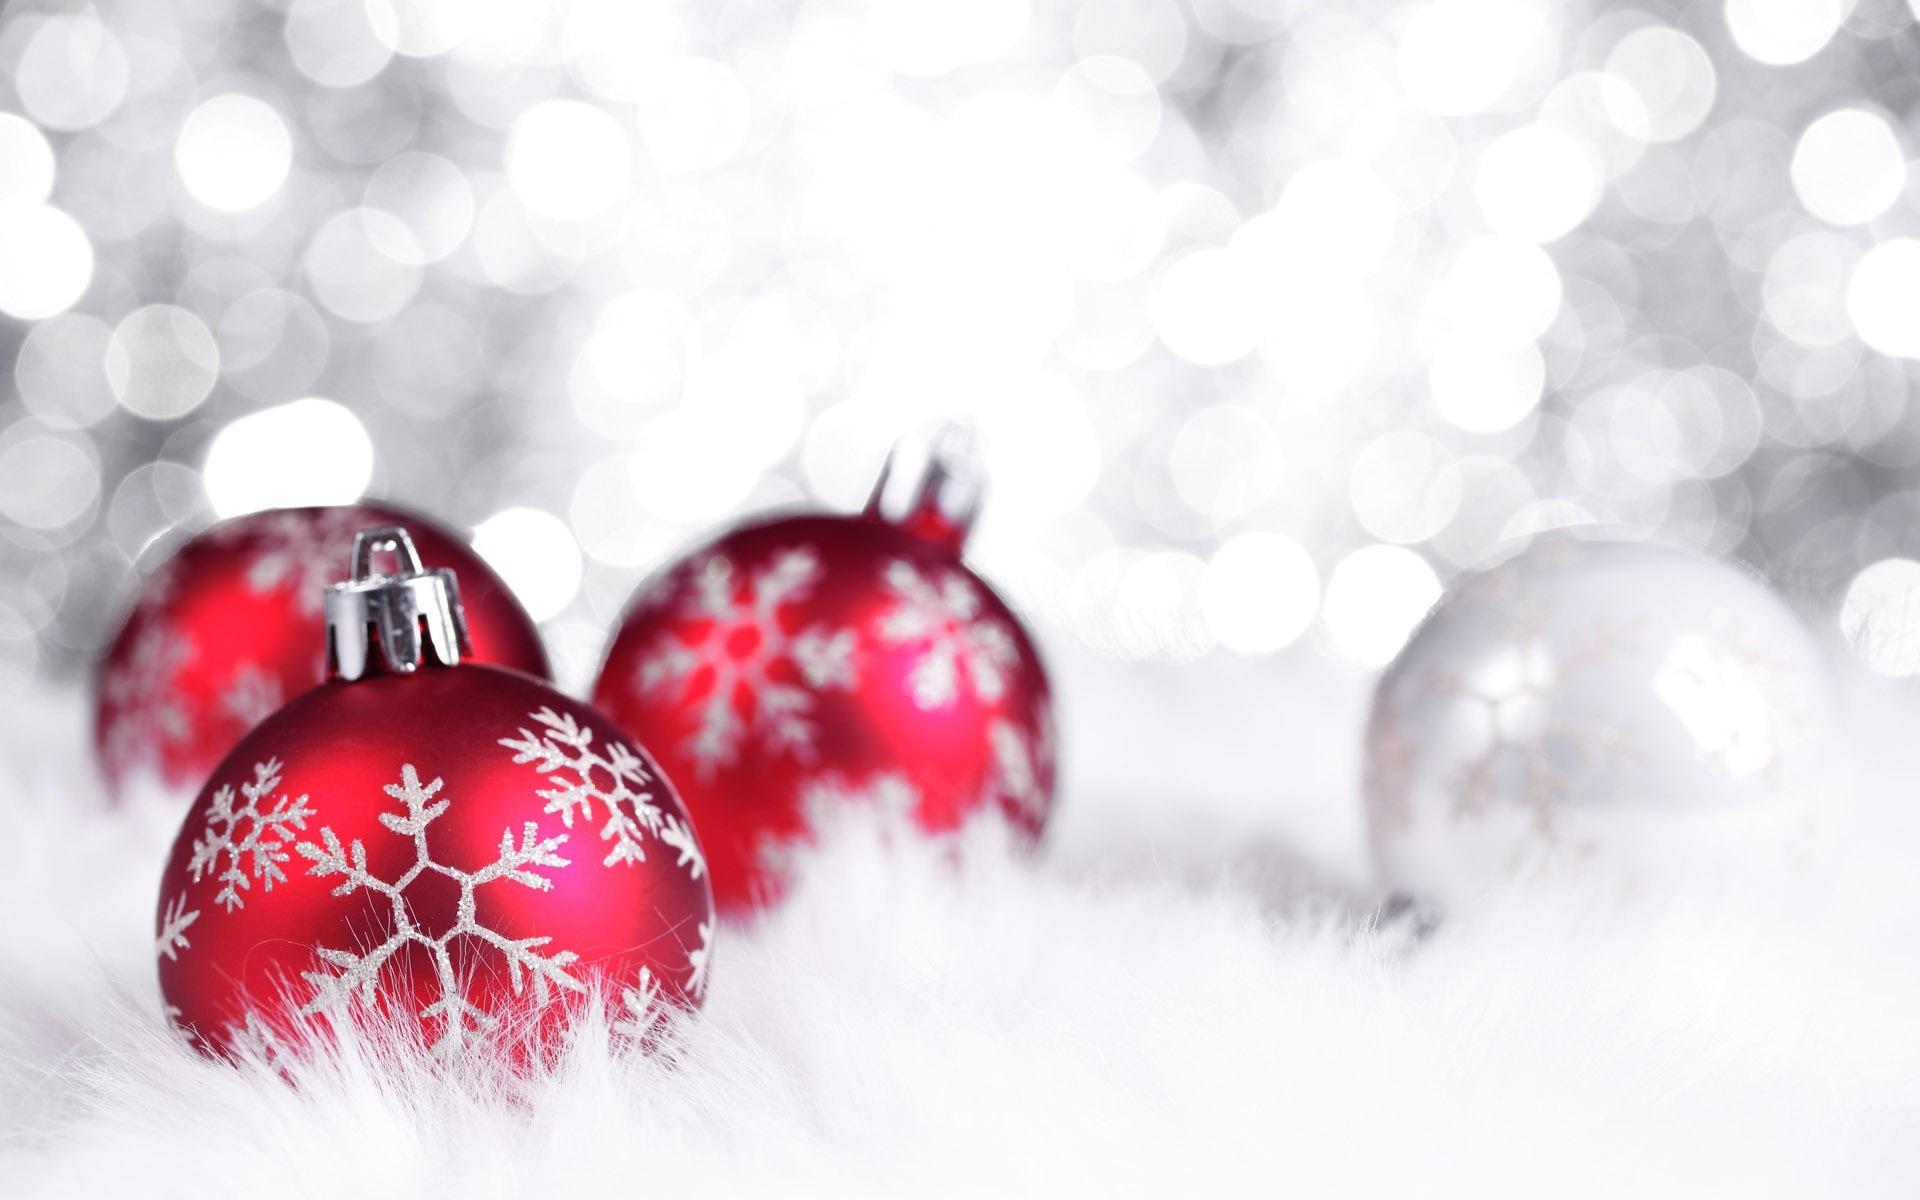 christmas backgrounds free download | pixelstalk